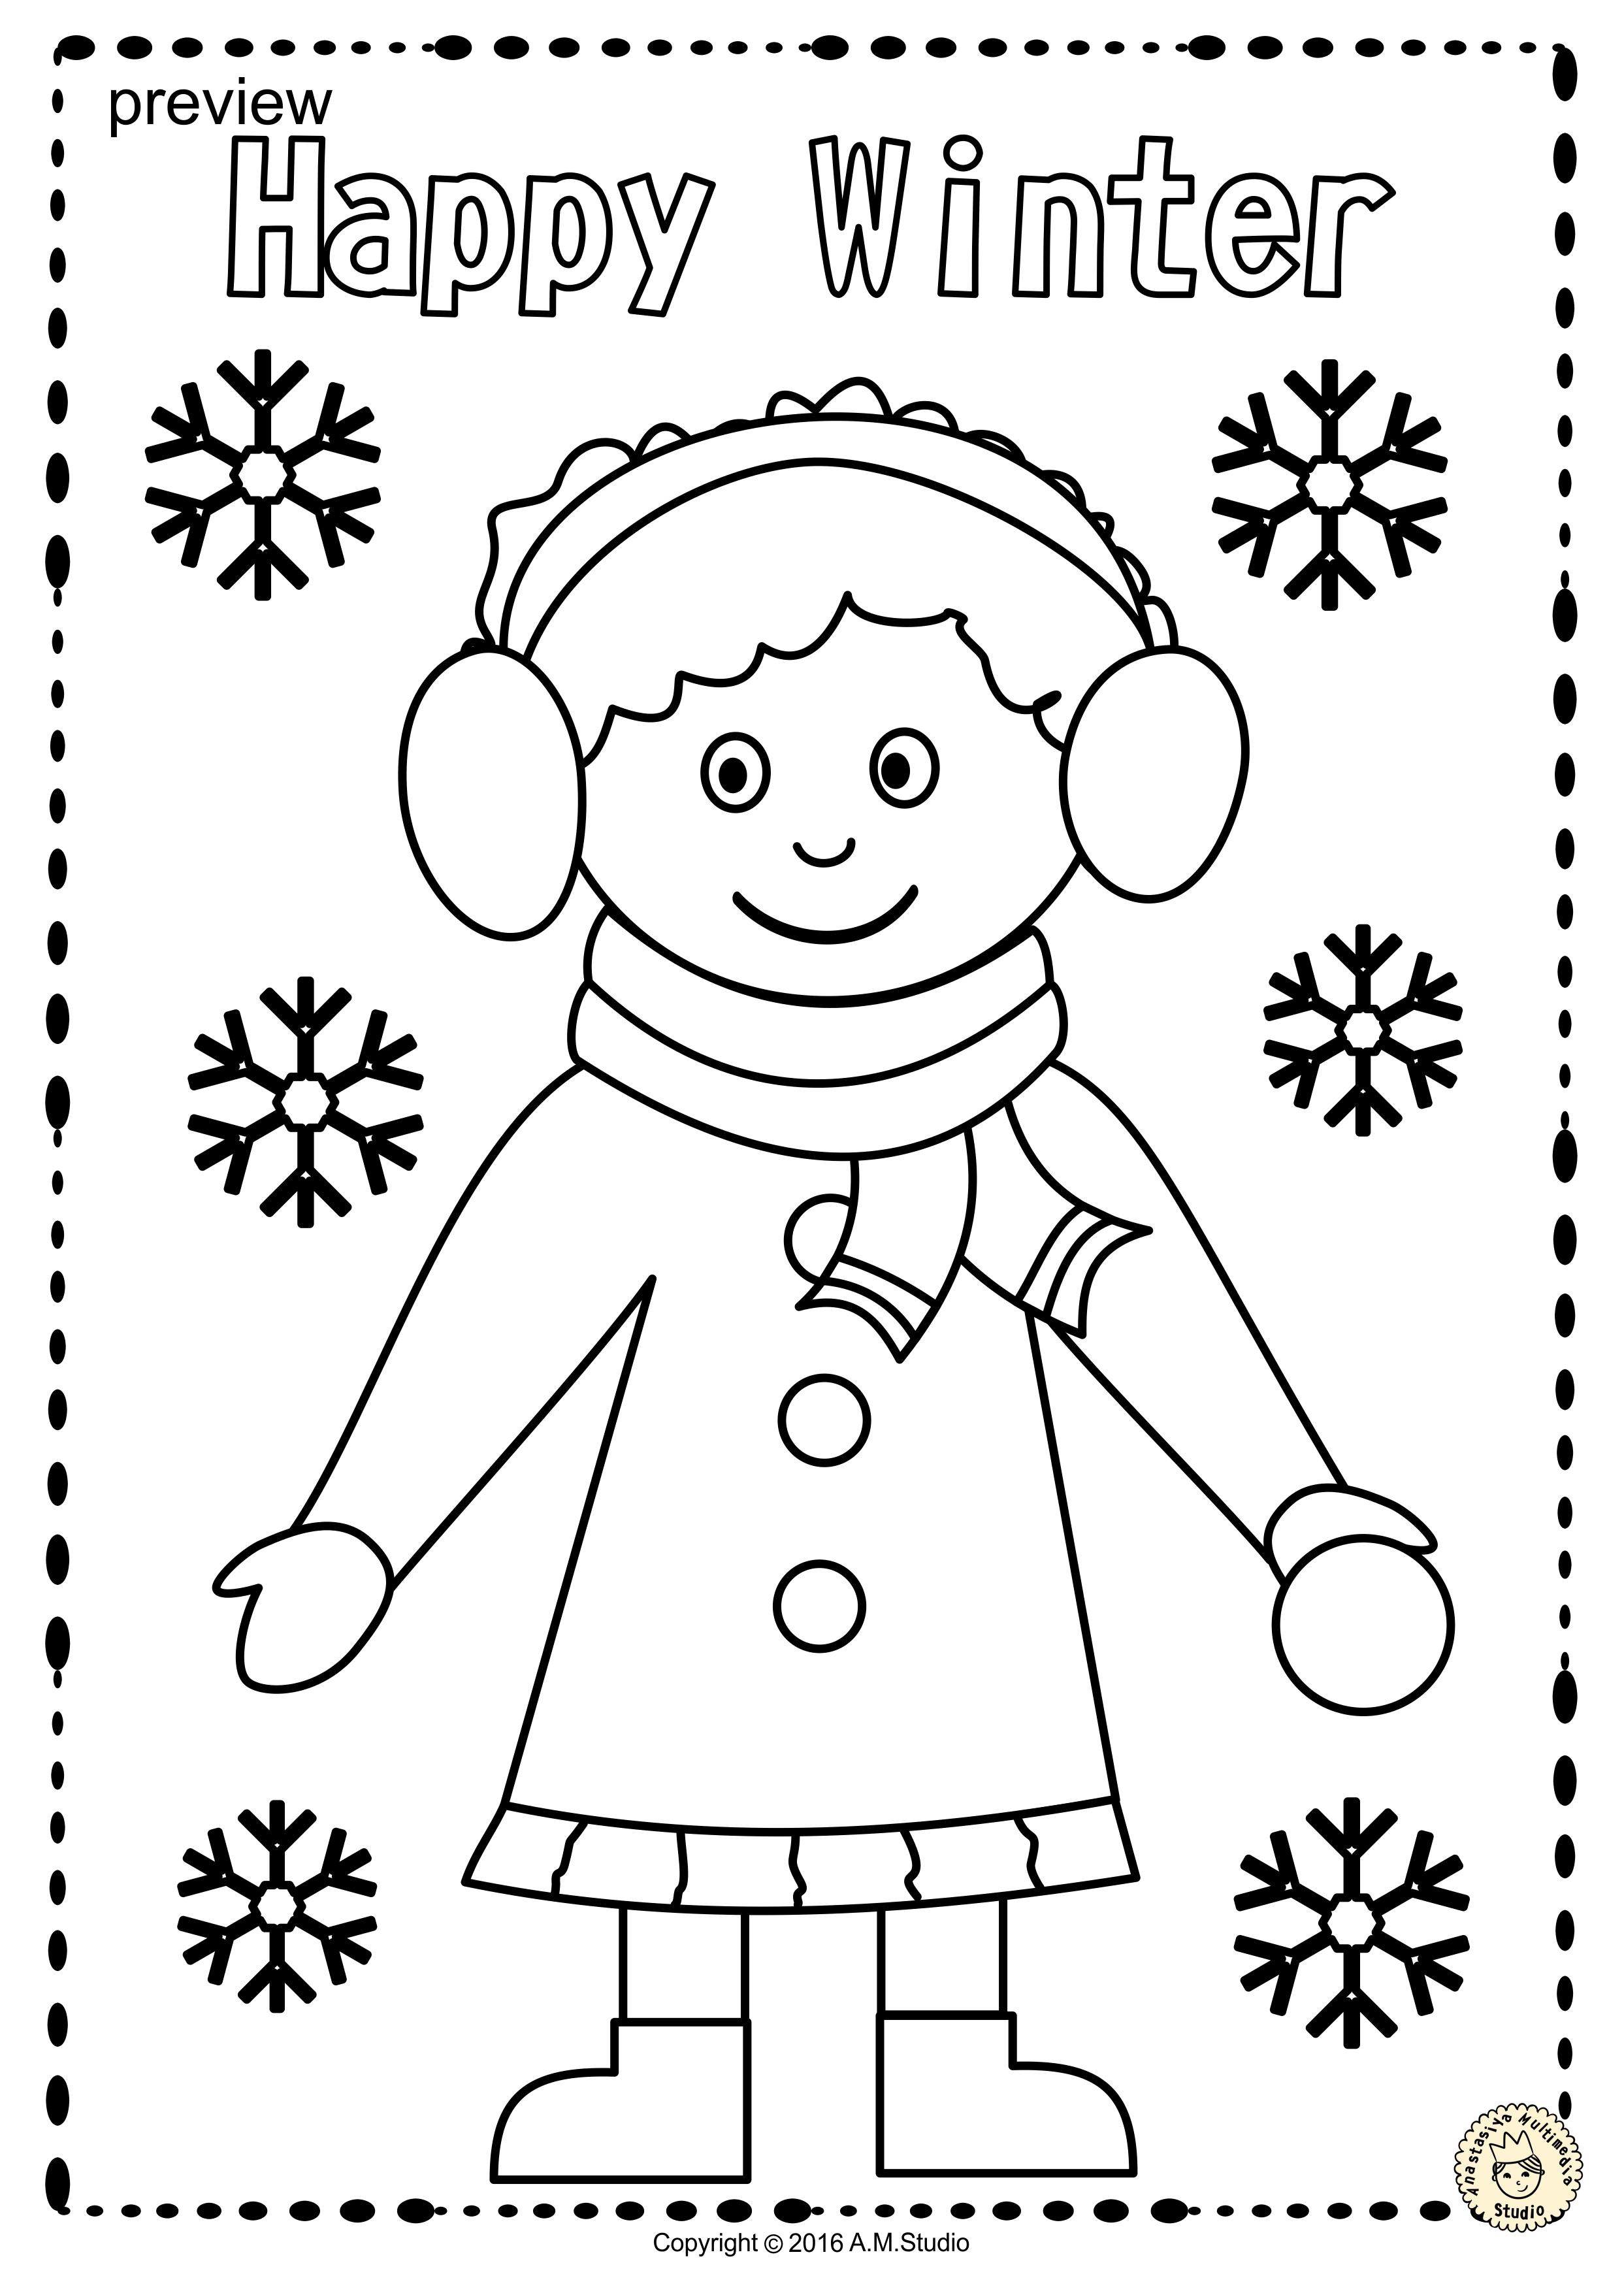 Winter Coloring Pages Anastasiya Multimedia Studio Winter Crafts Preschool Winter Crafts Winter Crafts For Kids